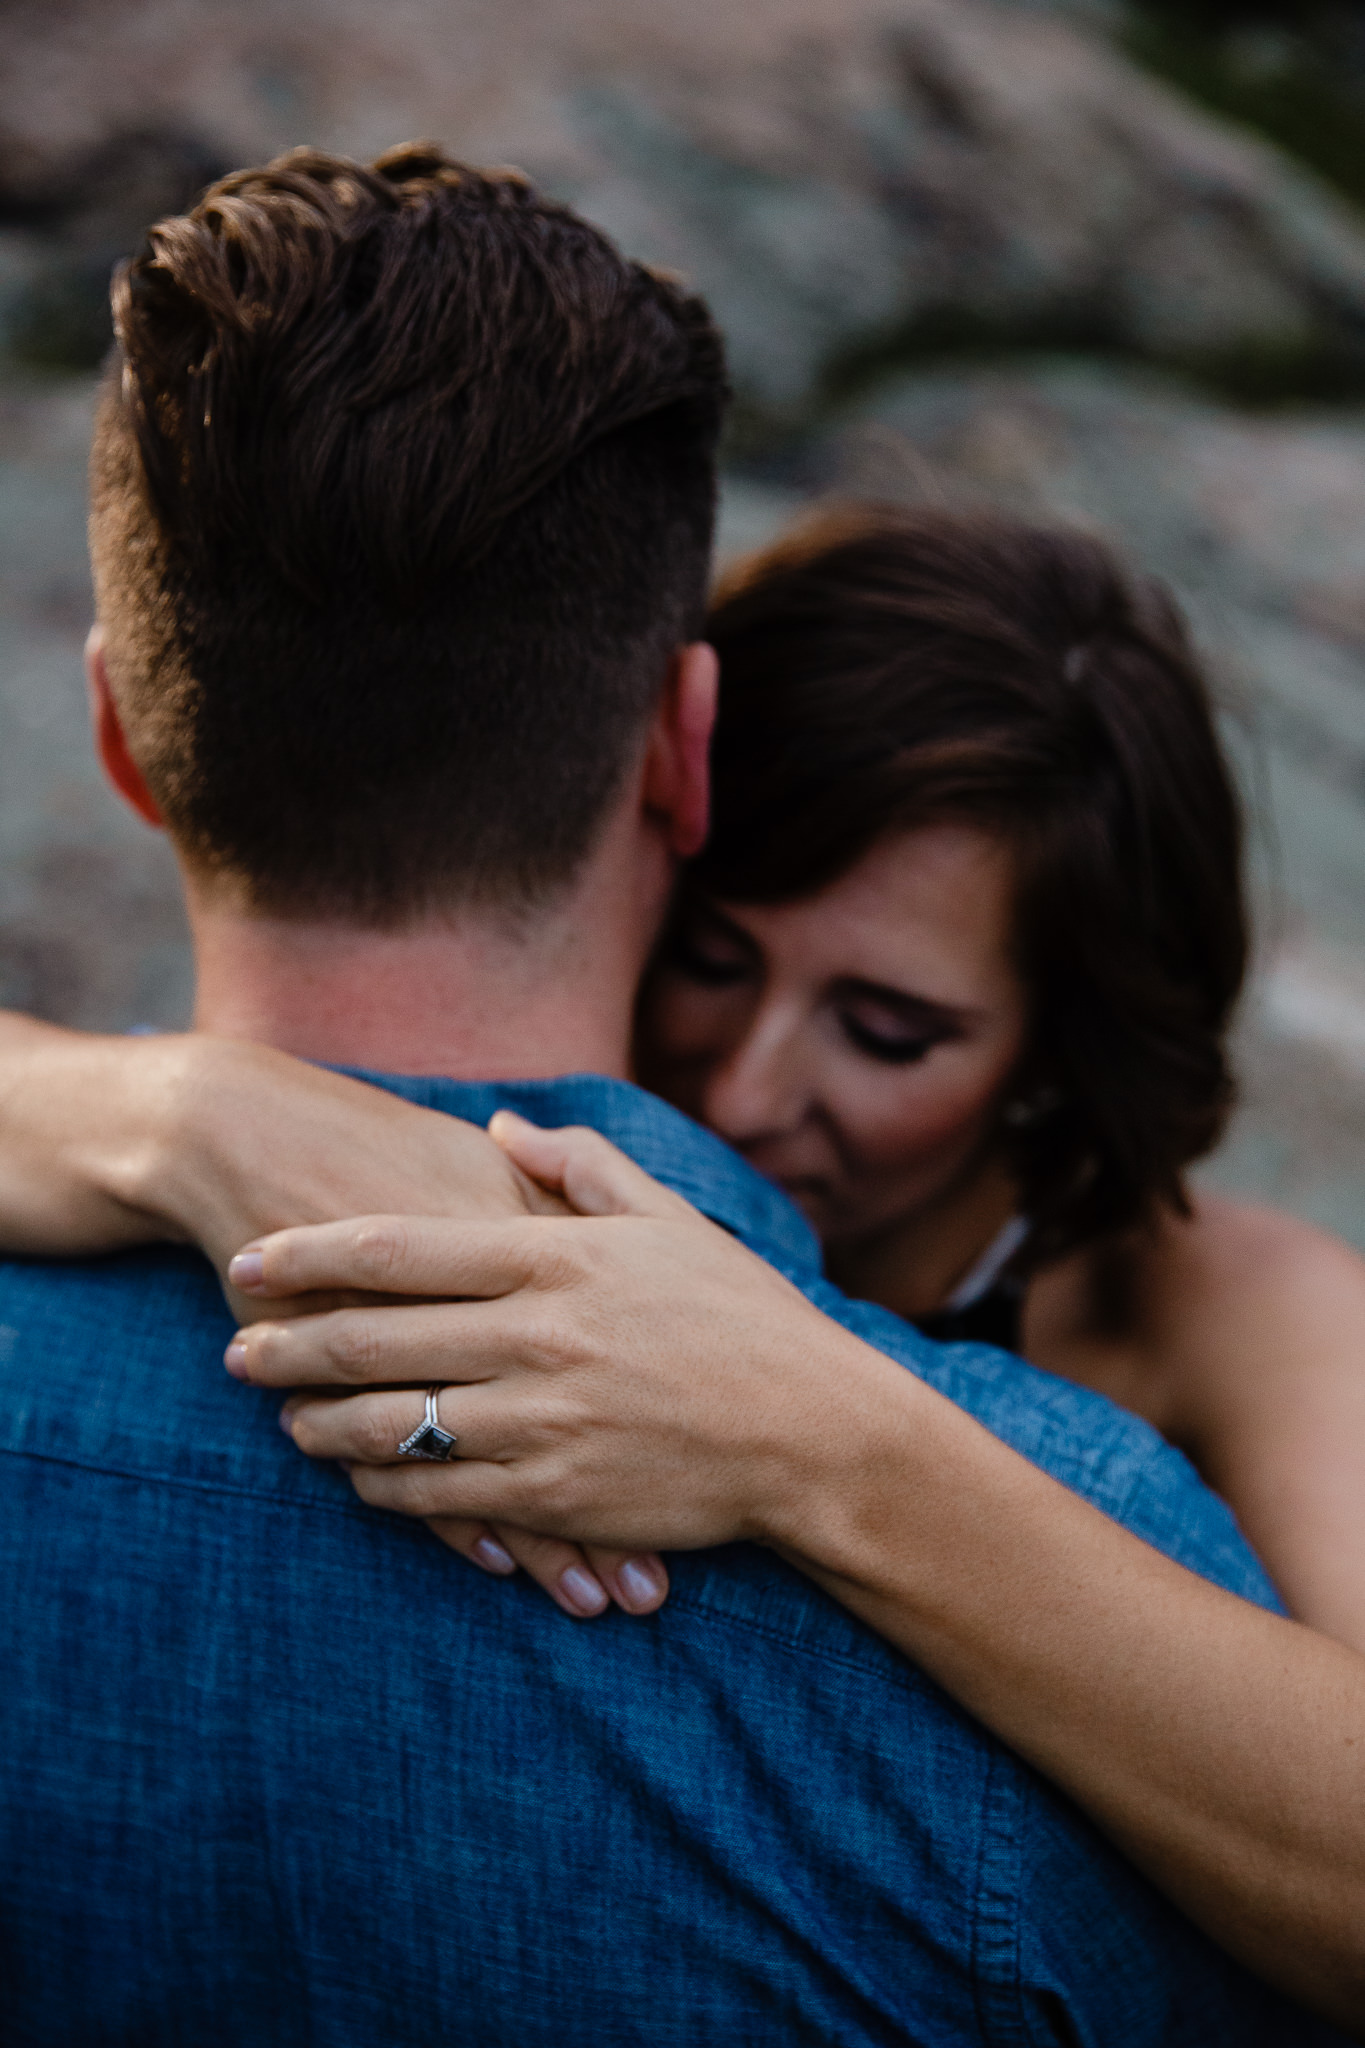 new-york-city-wedding-photographer-brooklyn-wedding-photographer-long-island-wedding-photographer-hudson-valley-wedding-photographer